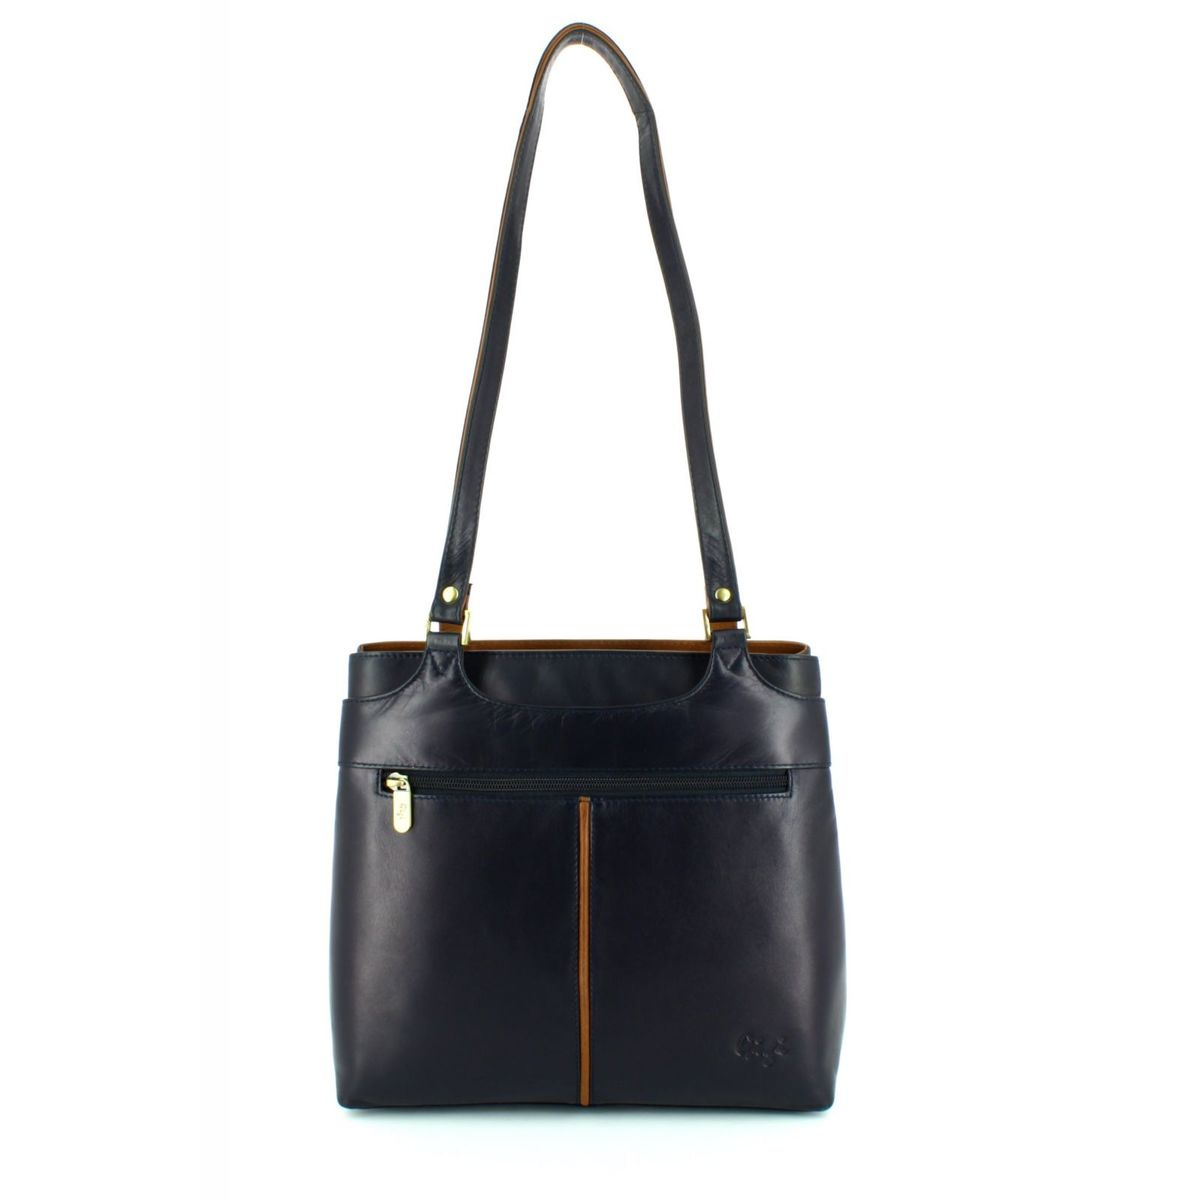 fb36fb08d9d Gigi Bags Othtt 544 0544-70 Navy/tan handbag